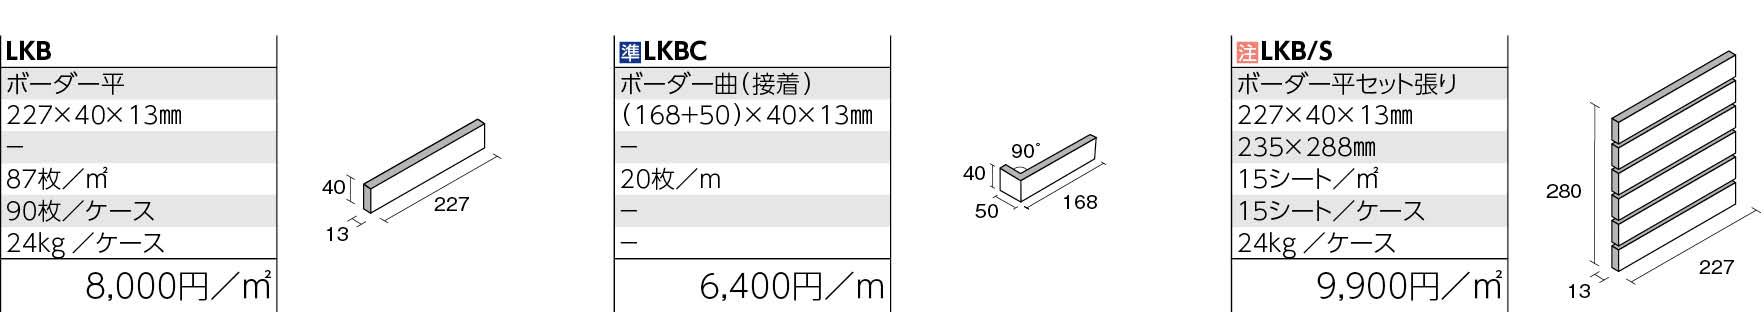 LKボーダー 形状図